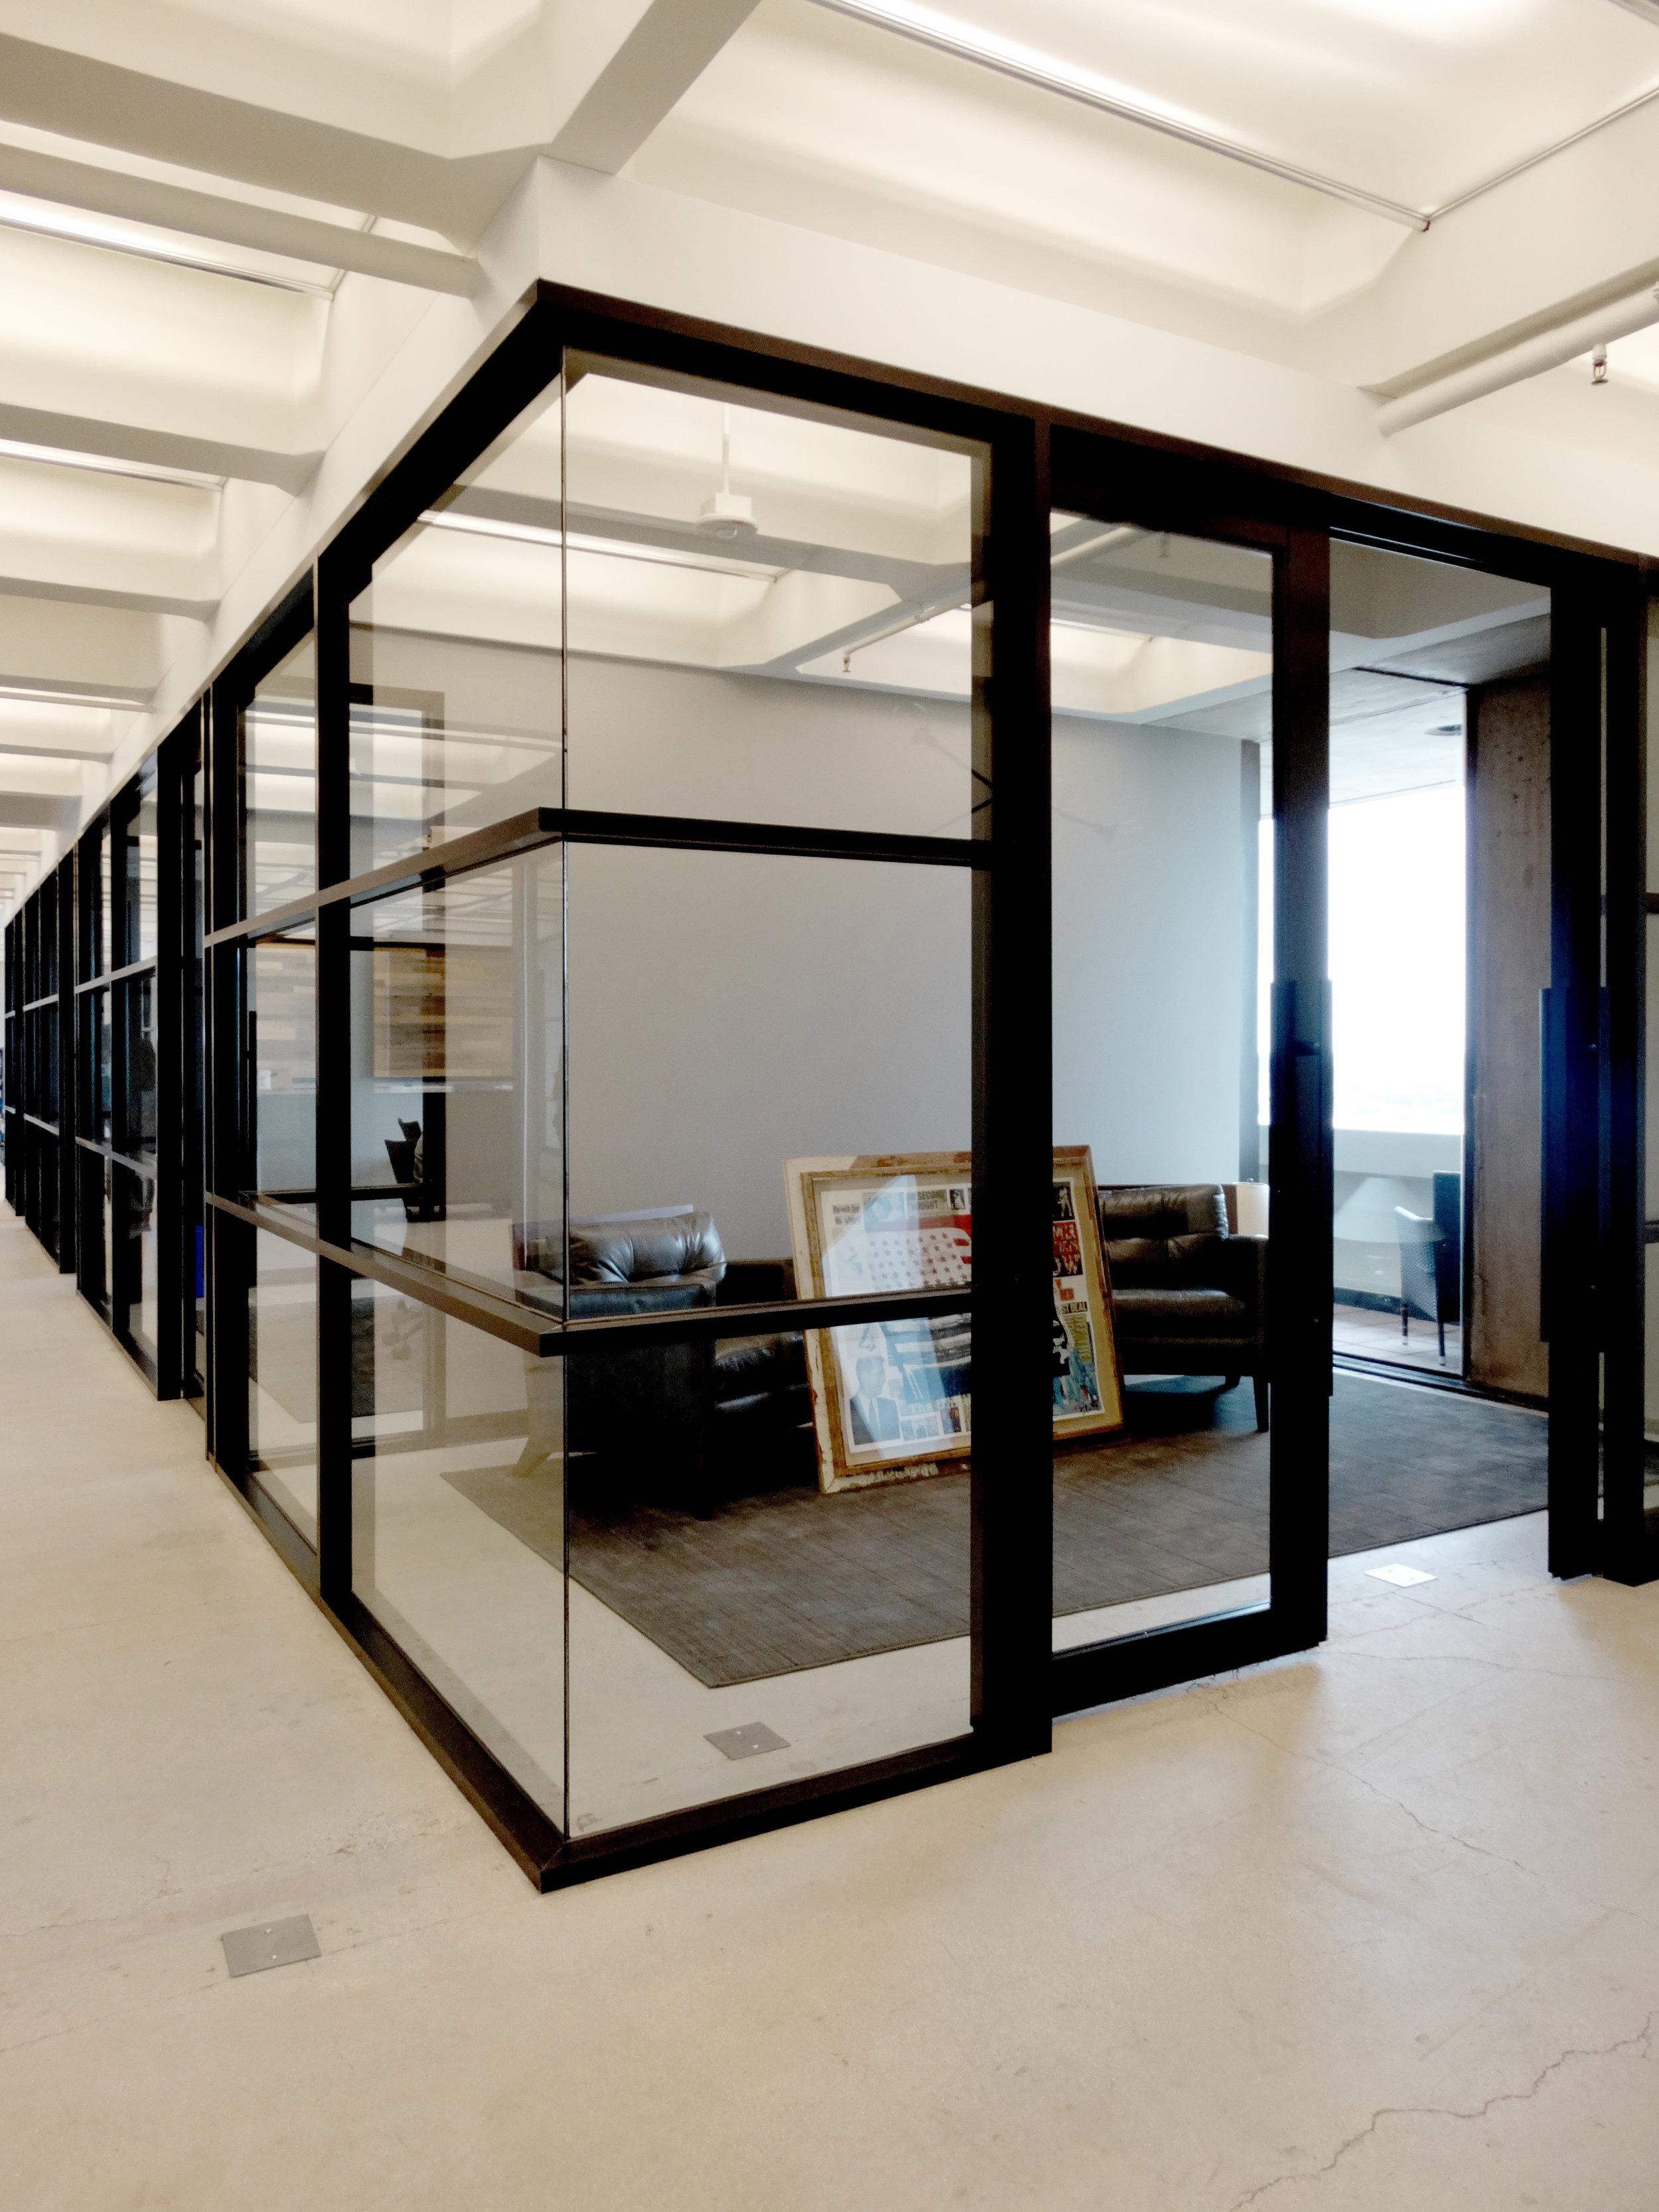 Encase Black Powder Coated Aluminum Framed Glass Wall System - Spaceworks AI.JPG